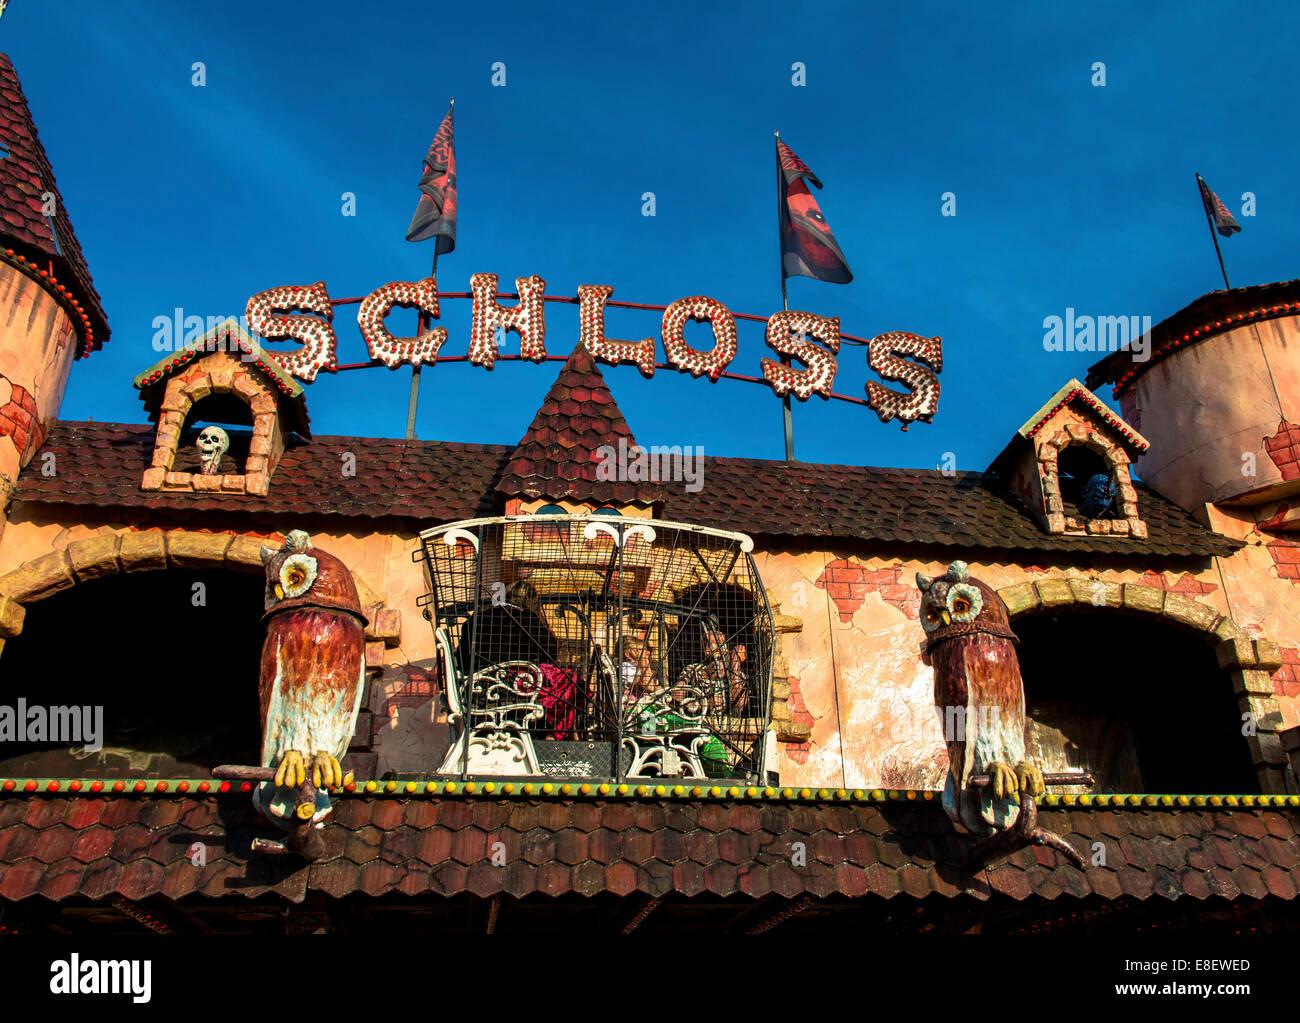 Geisterschloss, haunted castle, Oktoberfest, Theresienwiese, Munich, Upper Bavaria, Bavaria, Germany - Stock Image